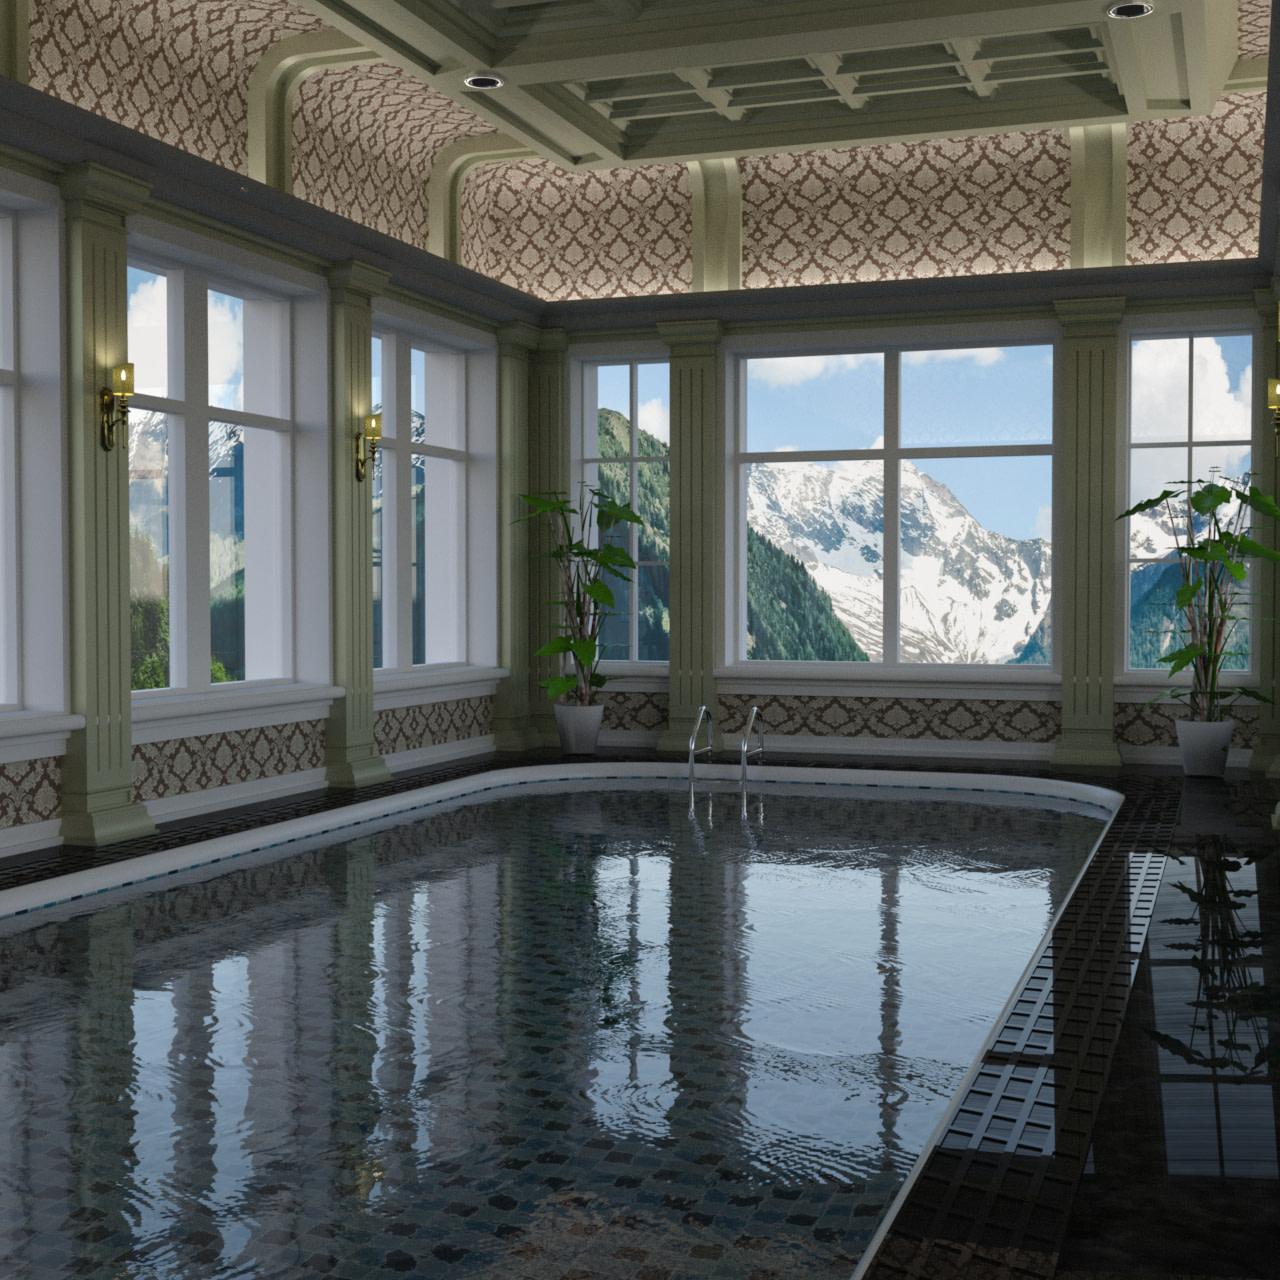 Rendering of a classic indoor pool 3d model